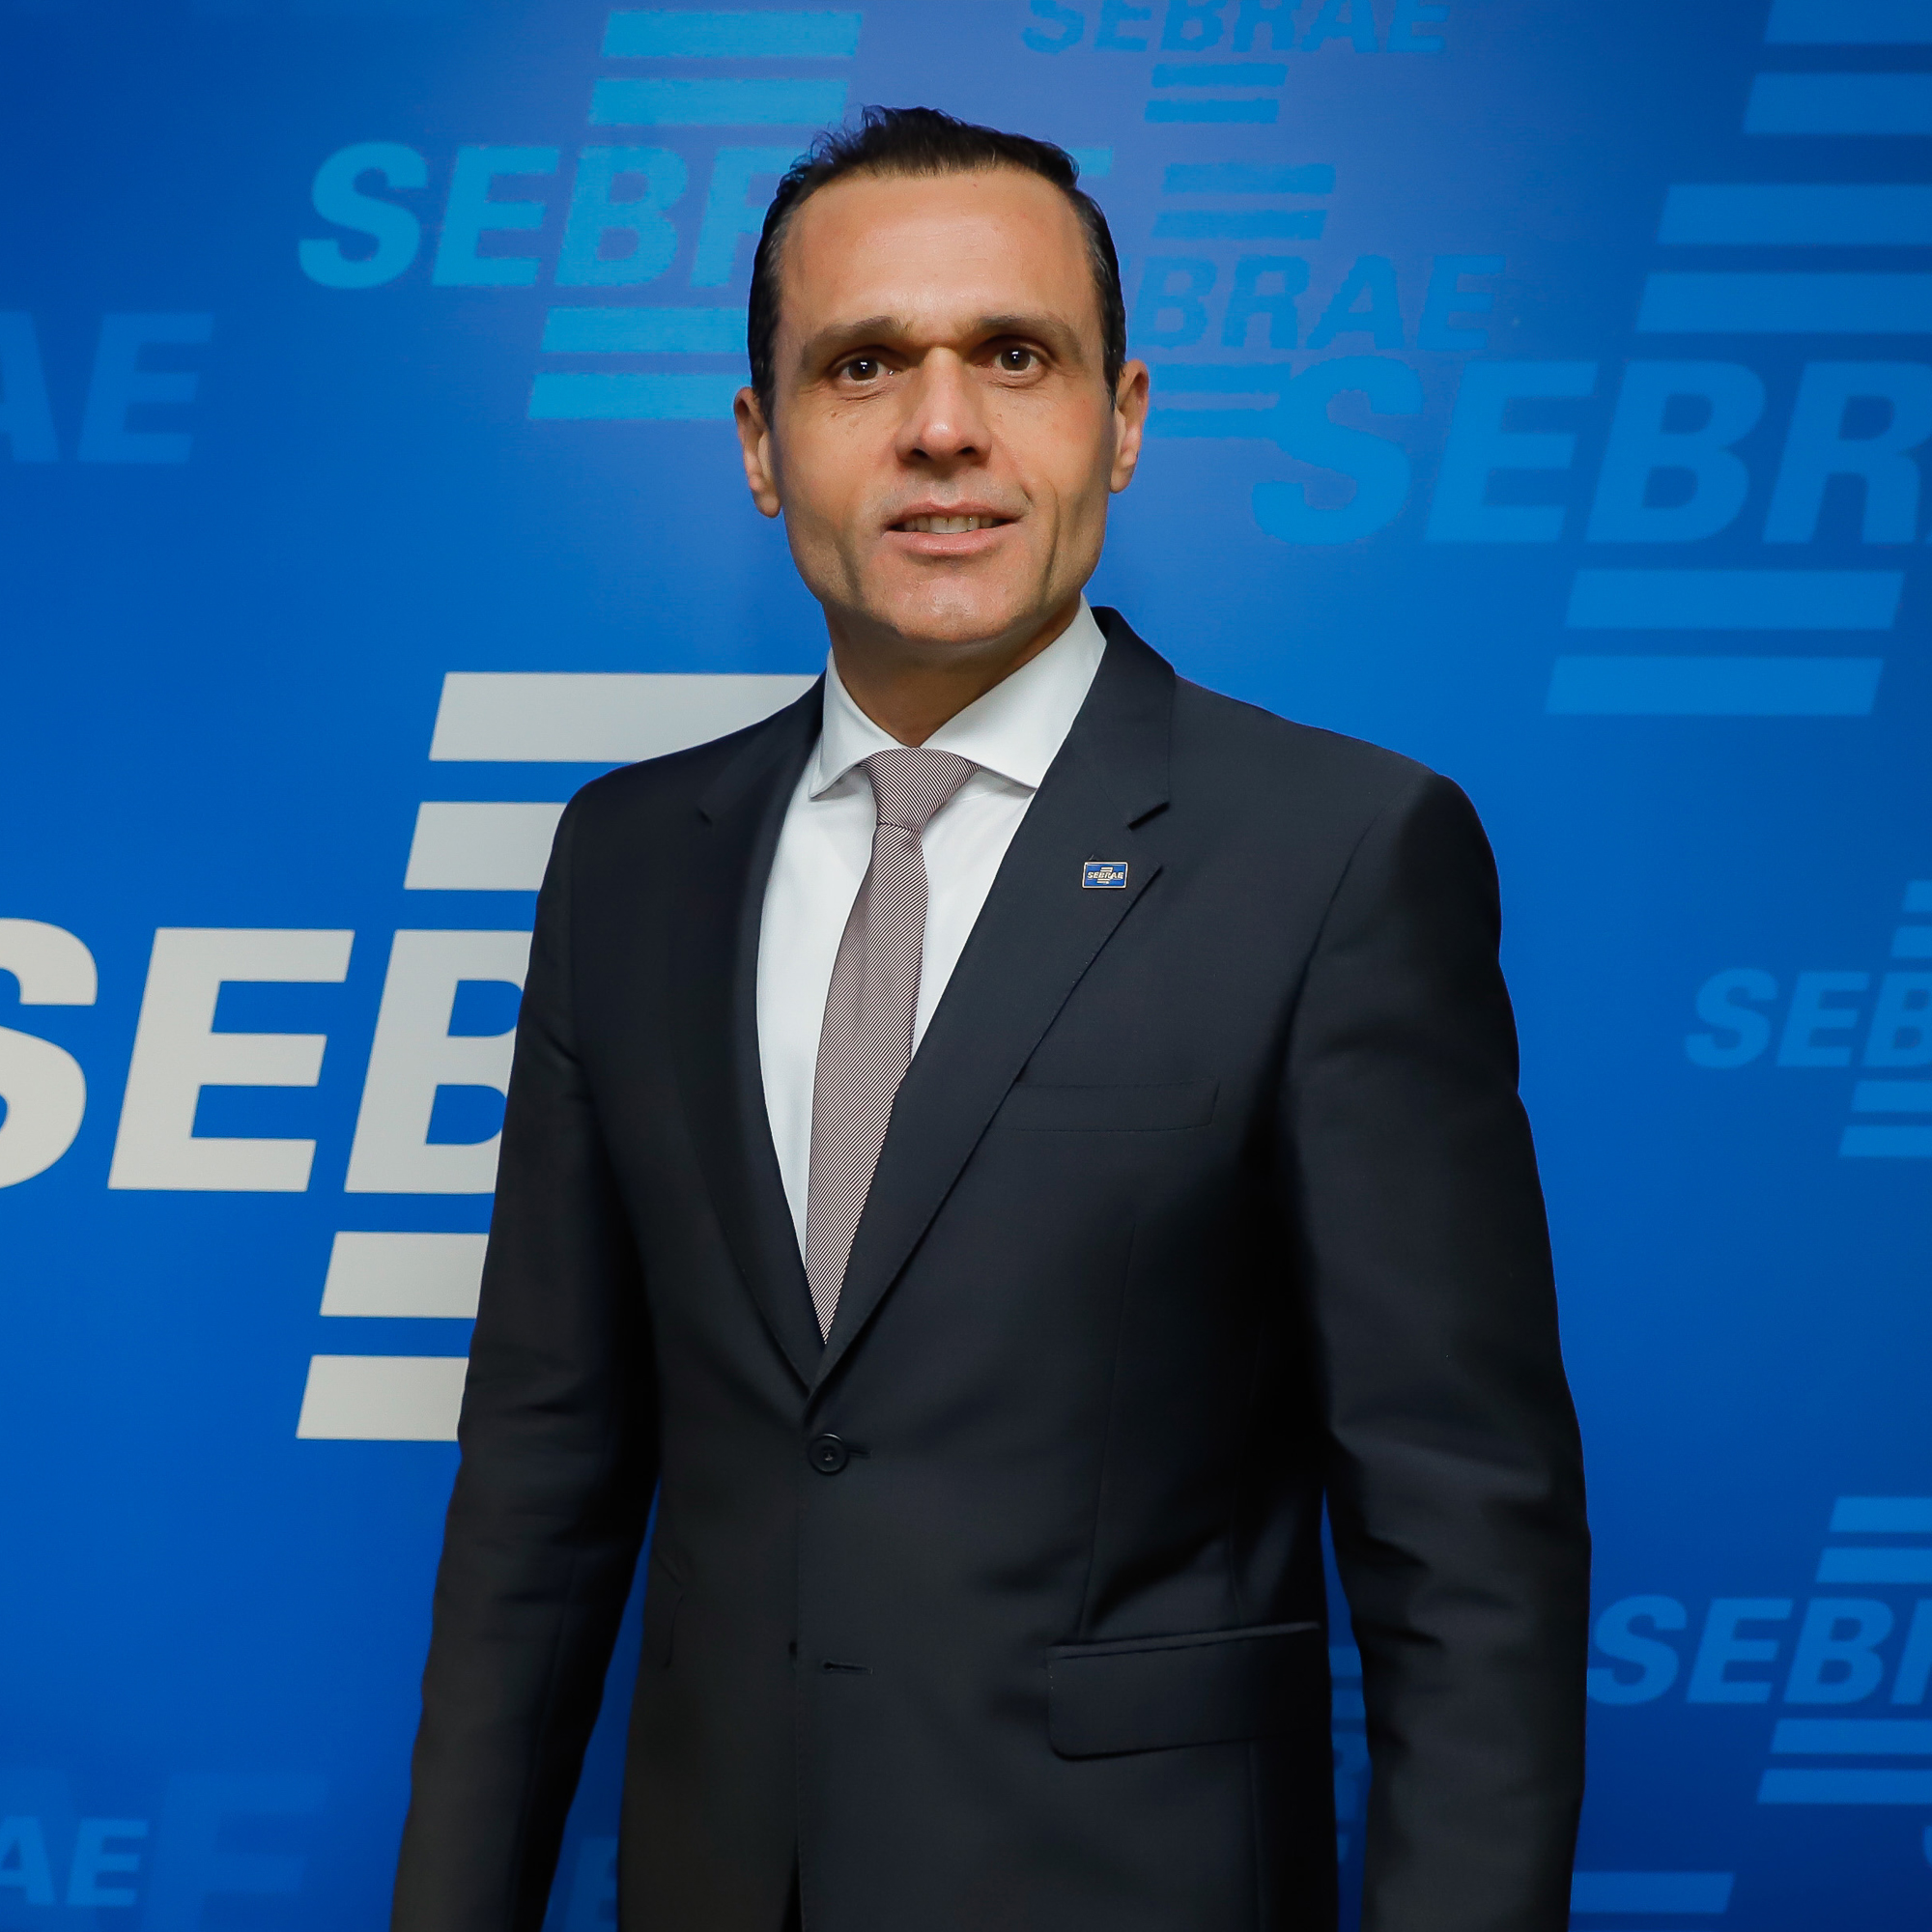 CFO Sebrae Nacional